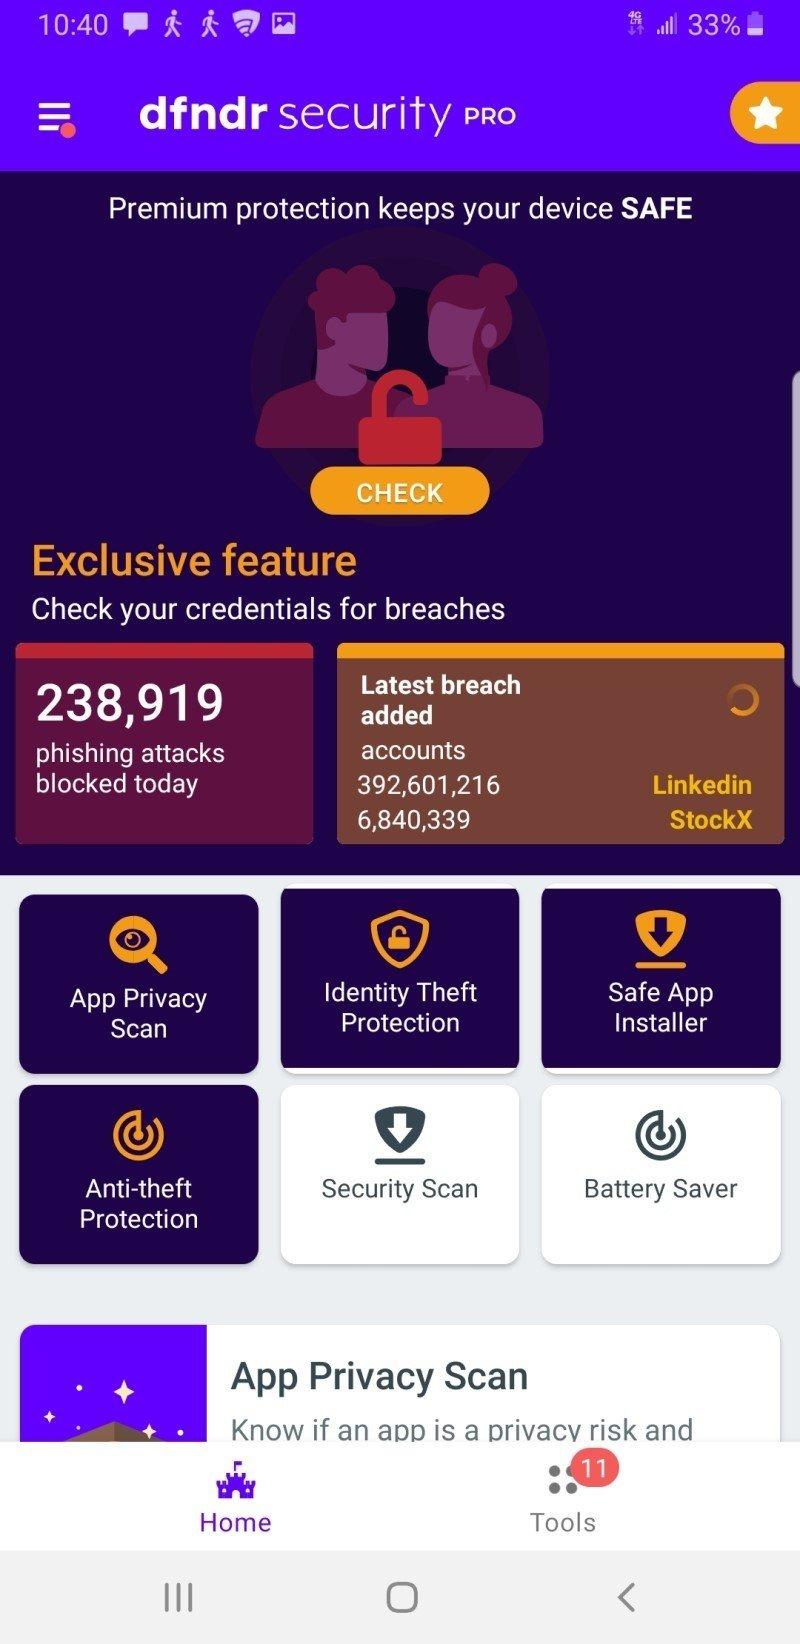 psafe-dfndr-mobile-antivirus-screenshot-